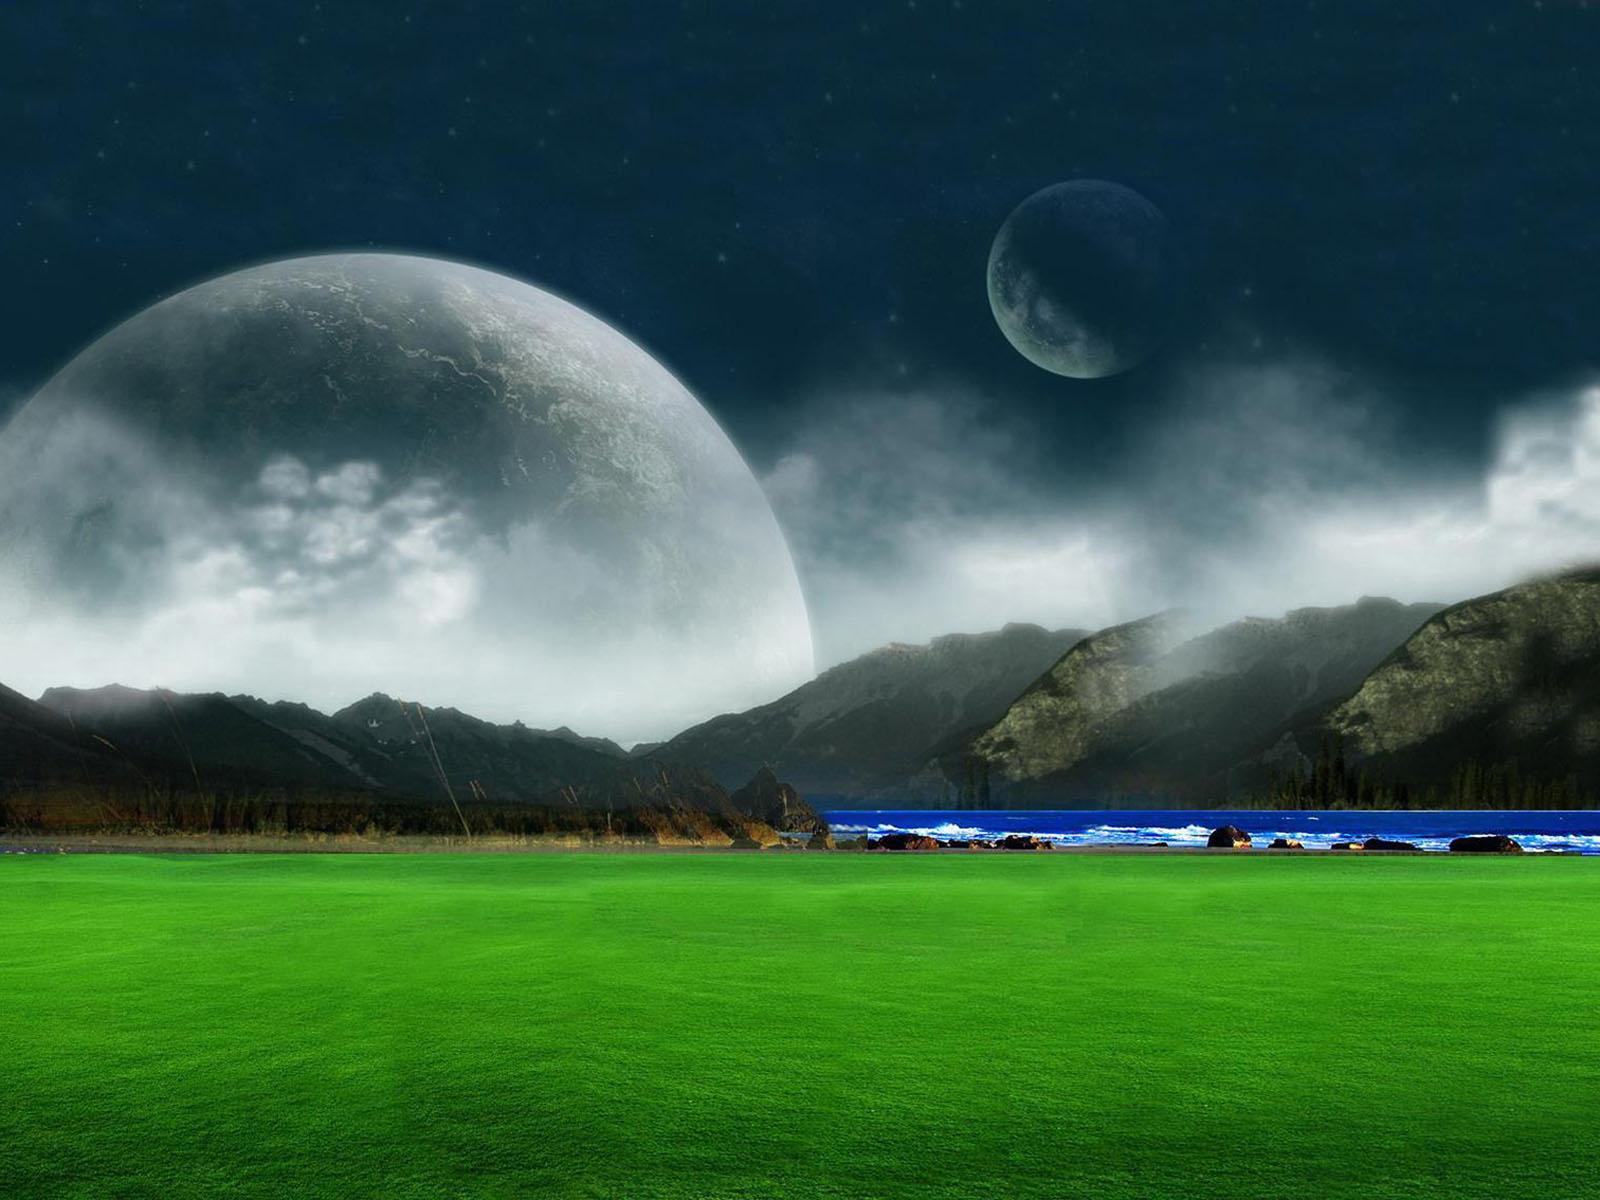 WALLPAPER: Amazing Wallpapers 3D Fantasy Land